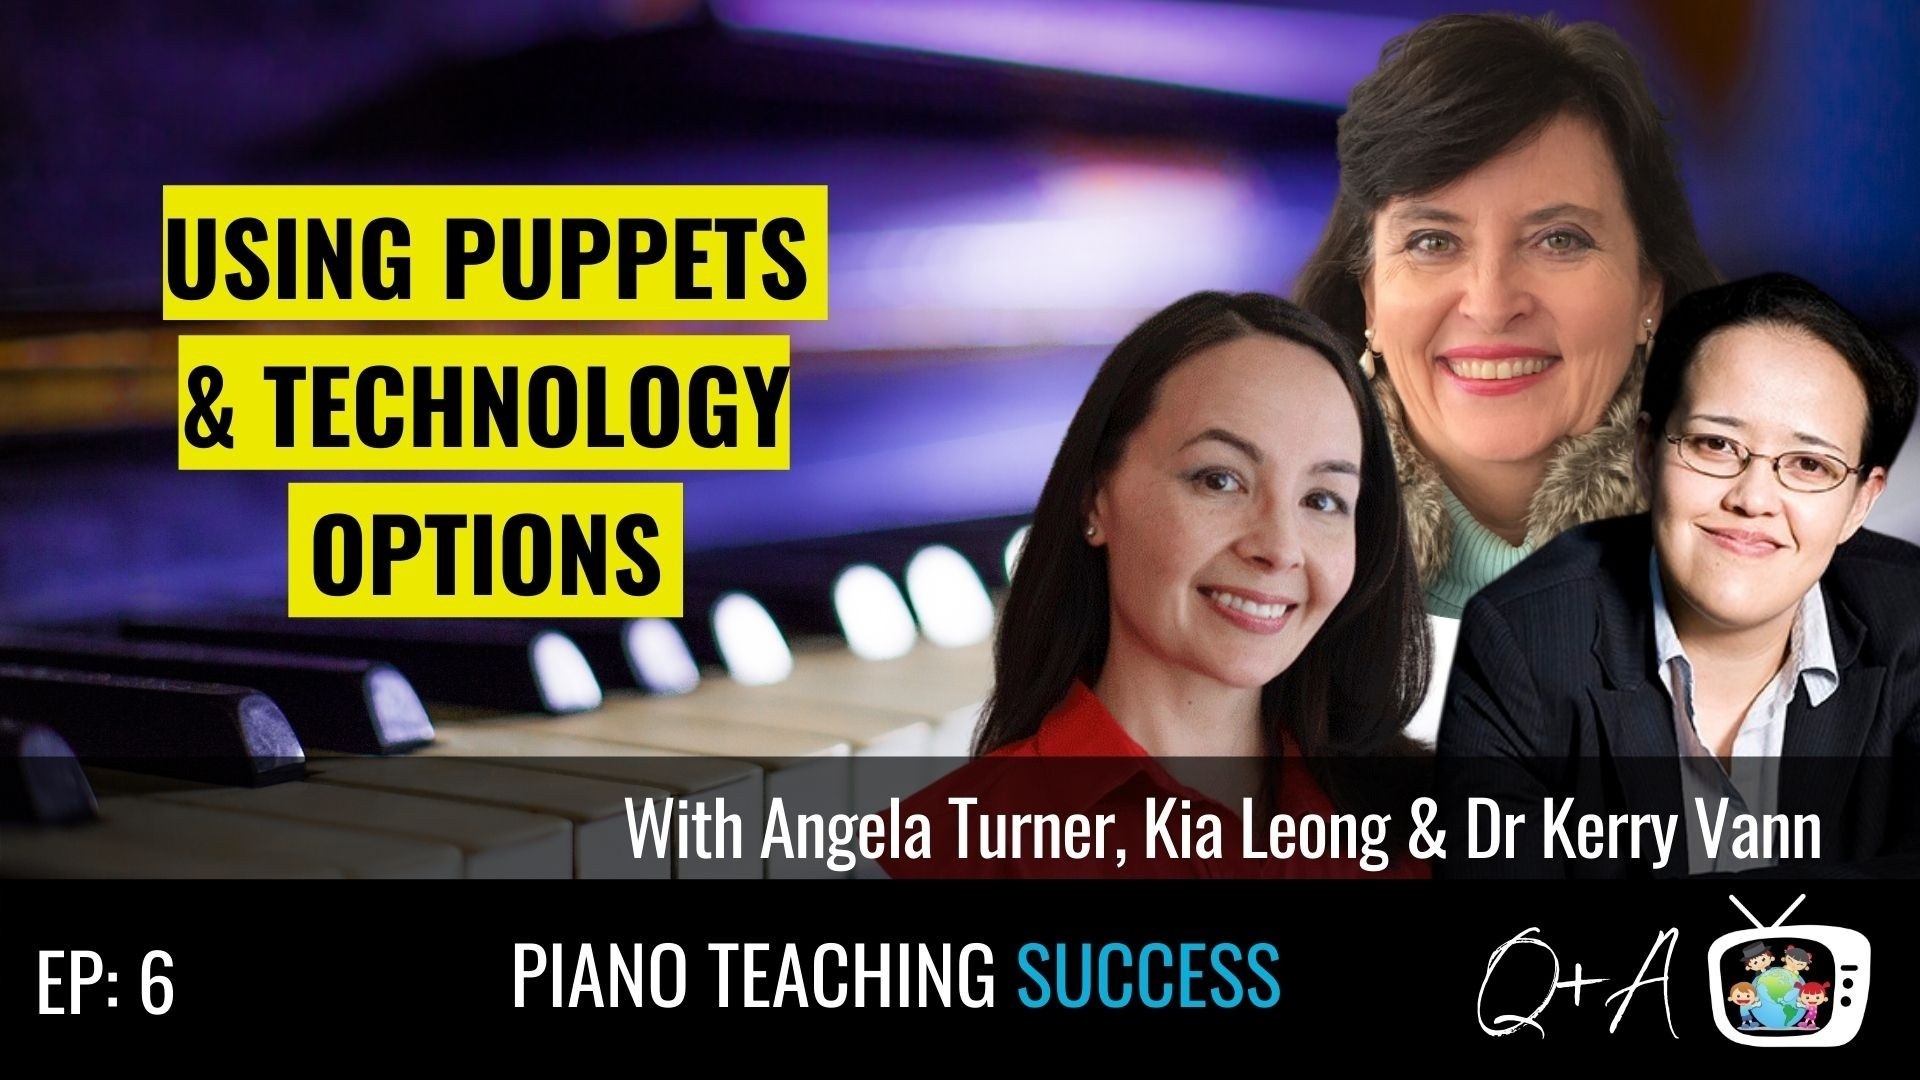 Angela Turner, Kia Leong, Dr Kerry Van